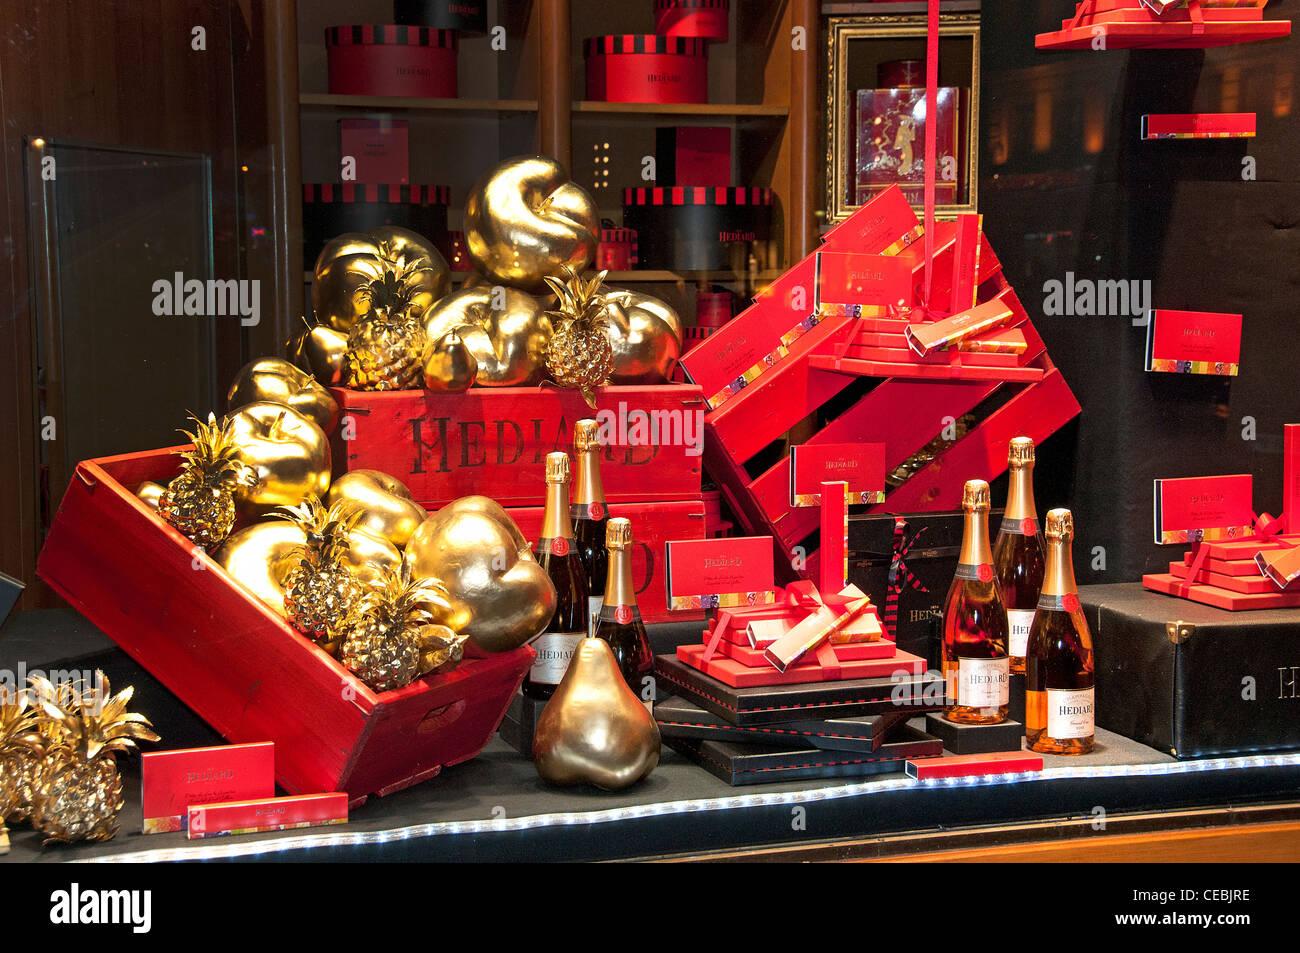 Place de Madeleine Paris luxury food shop Hediard France - Stock Image